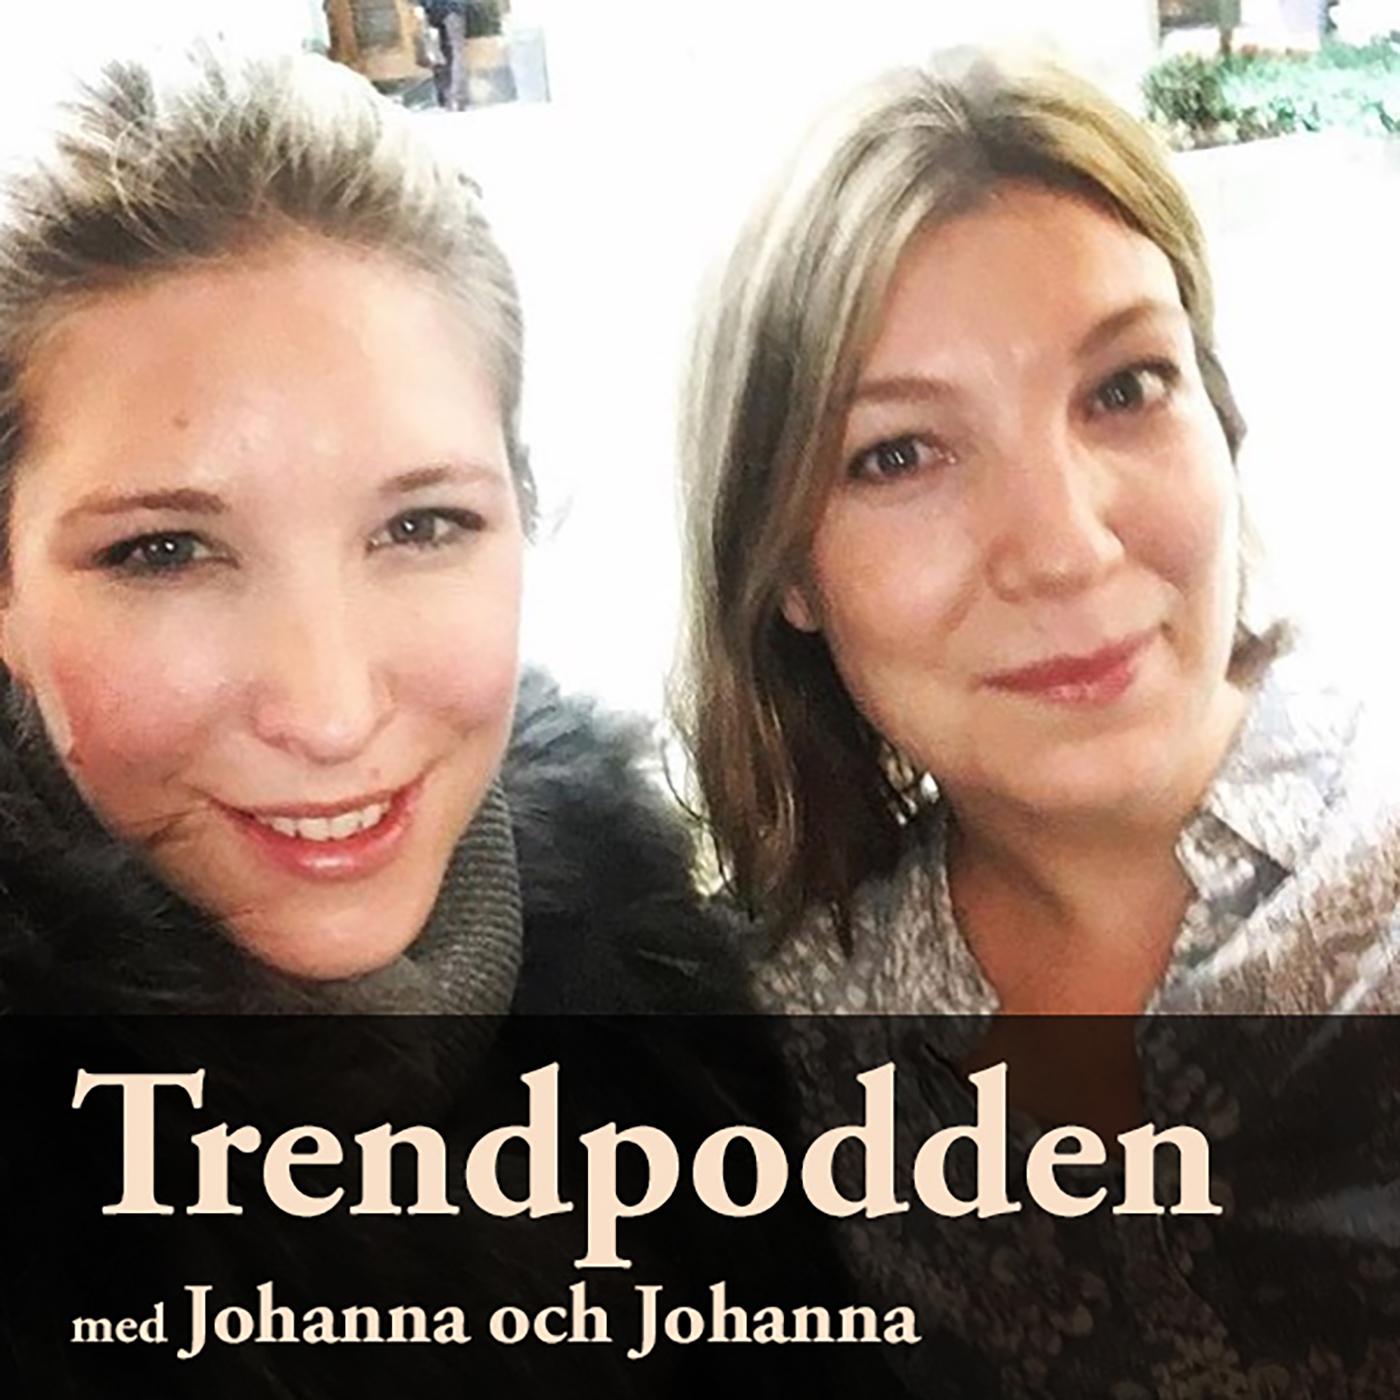 #trendpodden#medjohannaochjohanna#johannahulander#johannaengberg#podcast